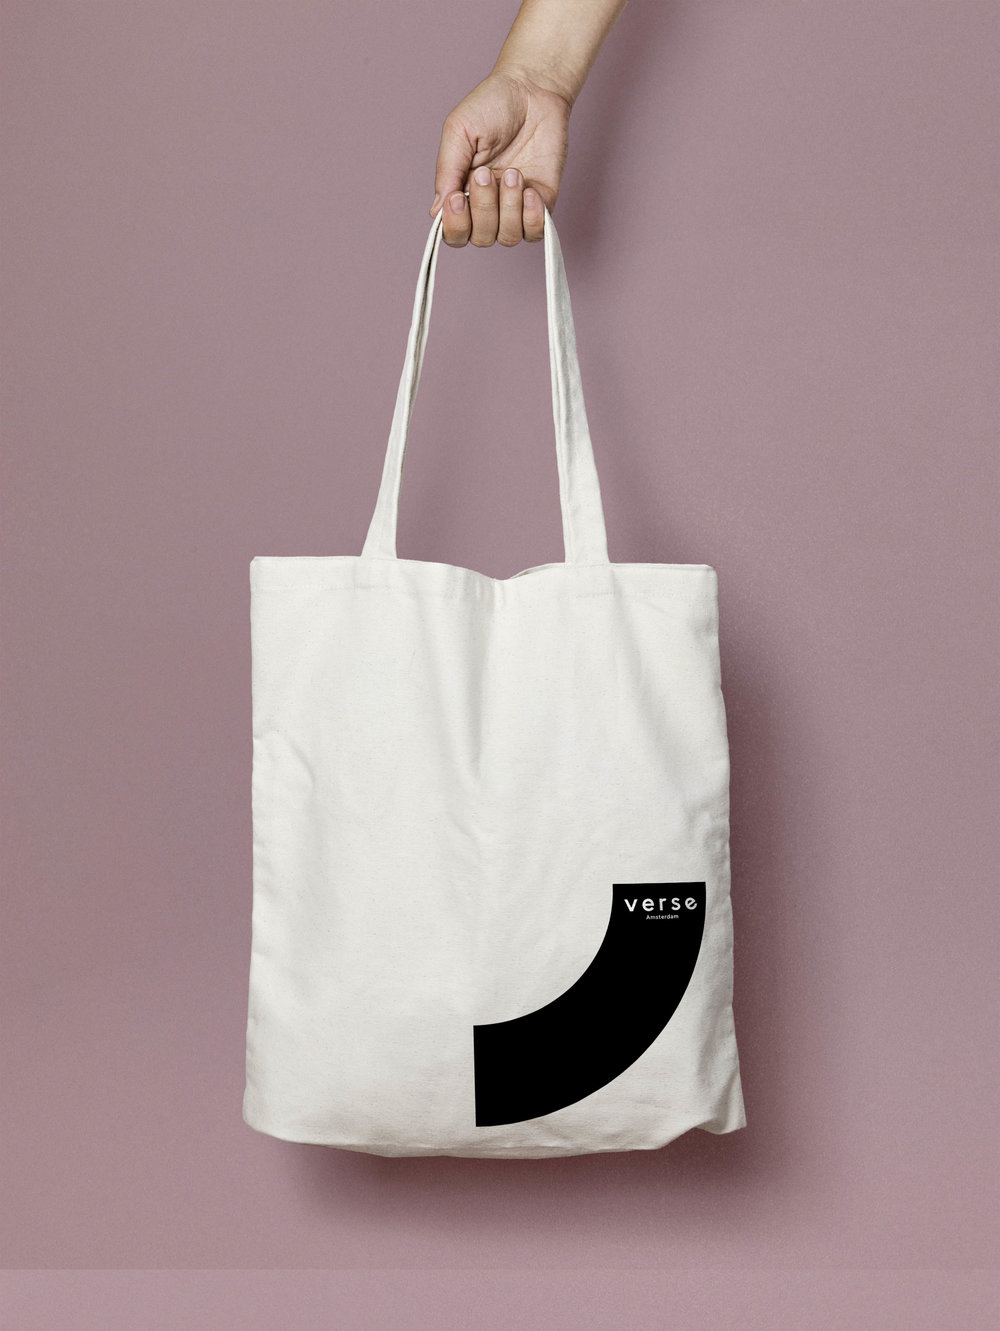 VERSE_pink_canvas bag ll.jpg